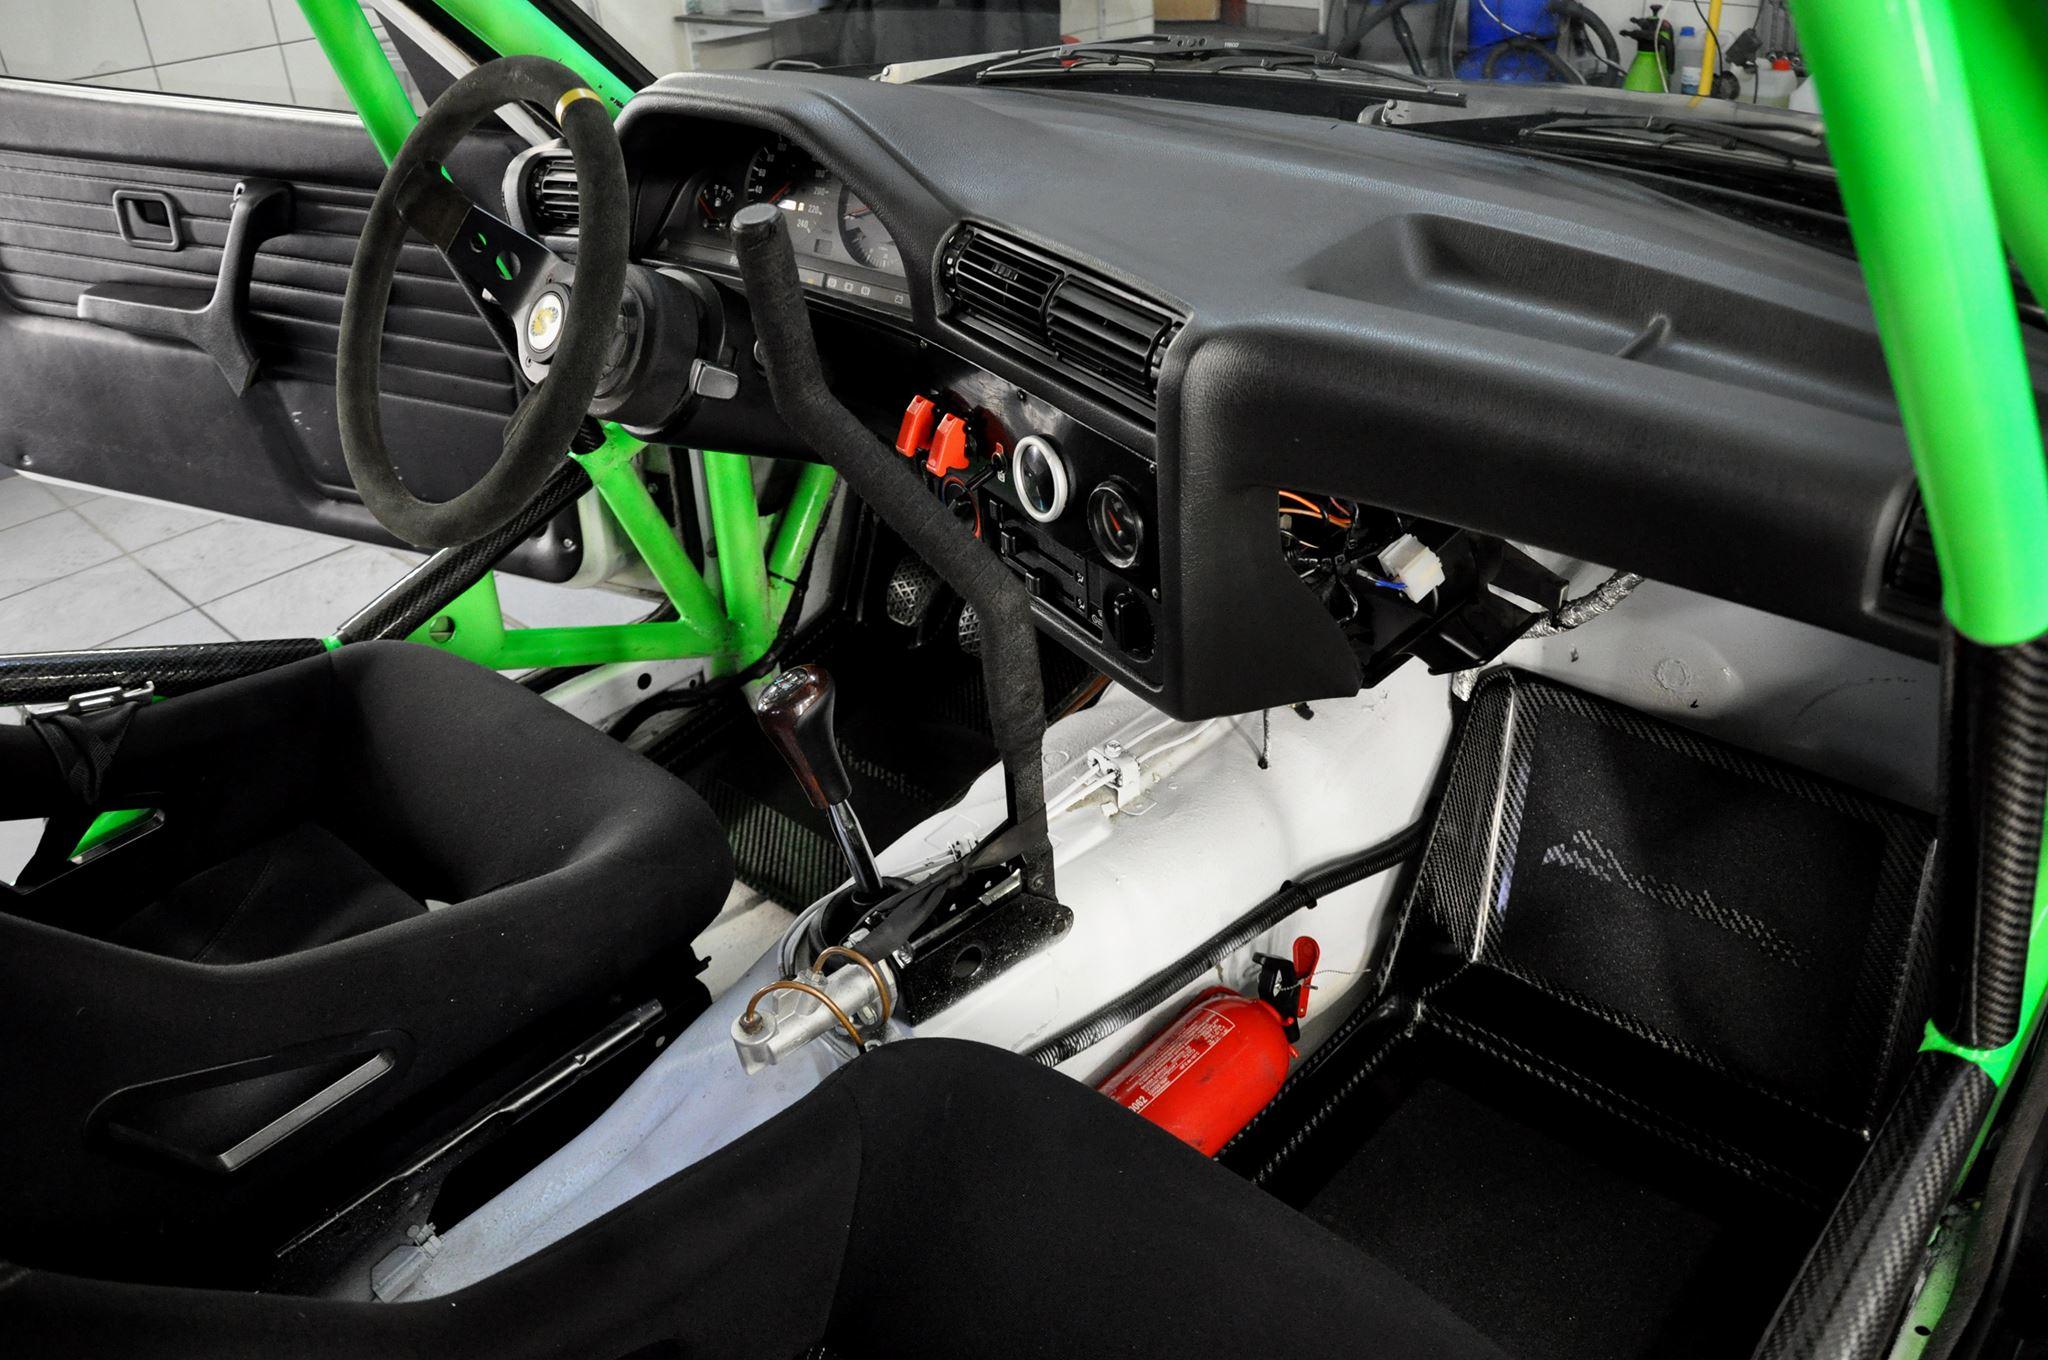 racecar_showandshine_detailing_mycie_auta